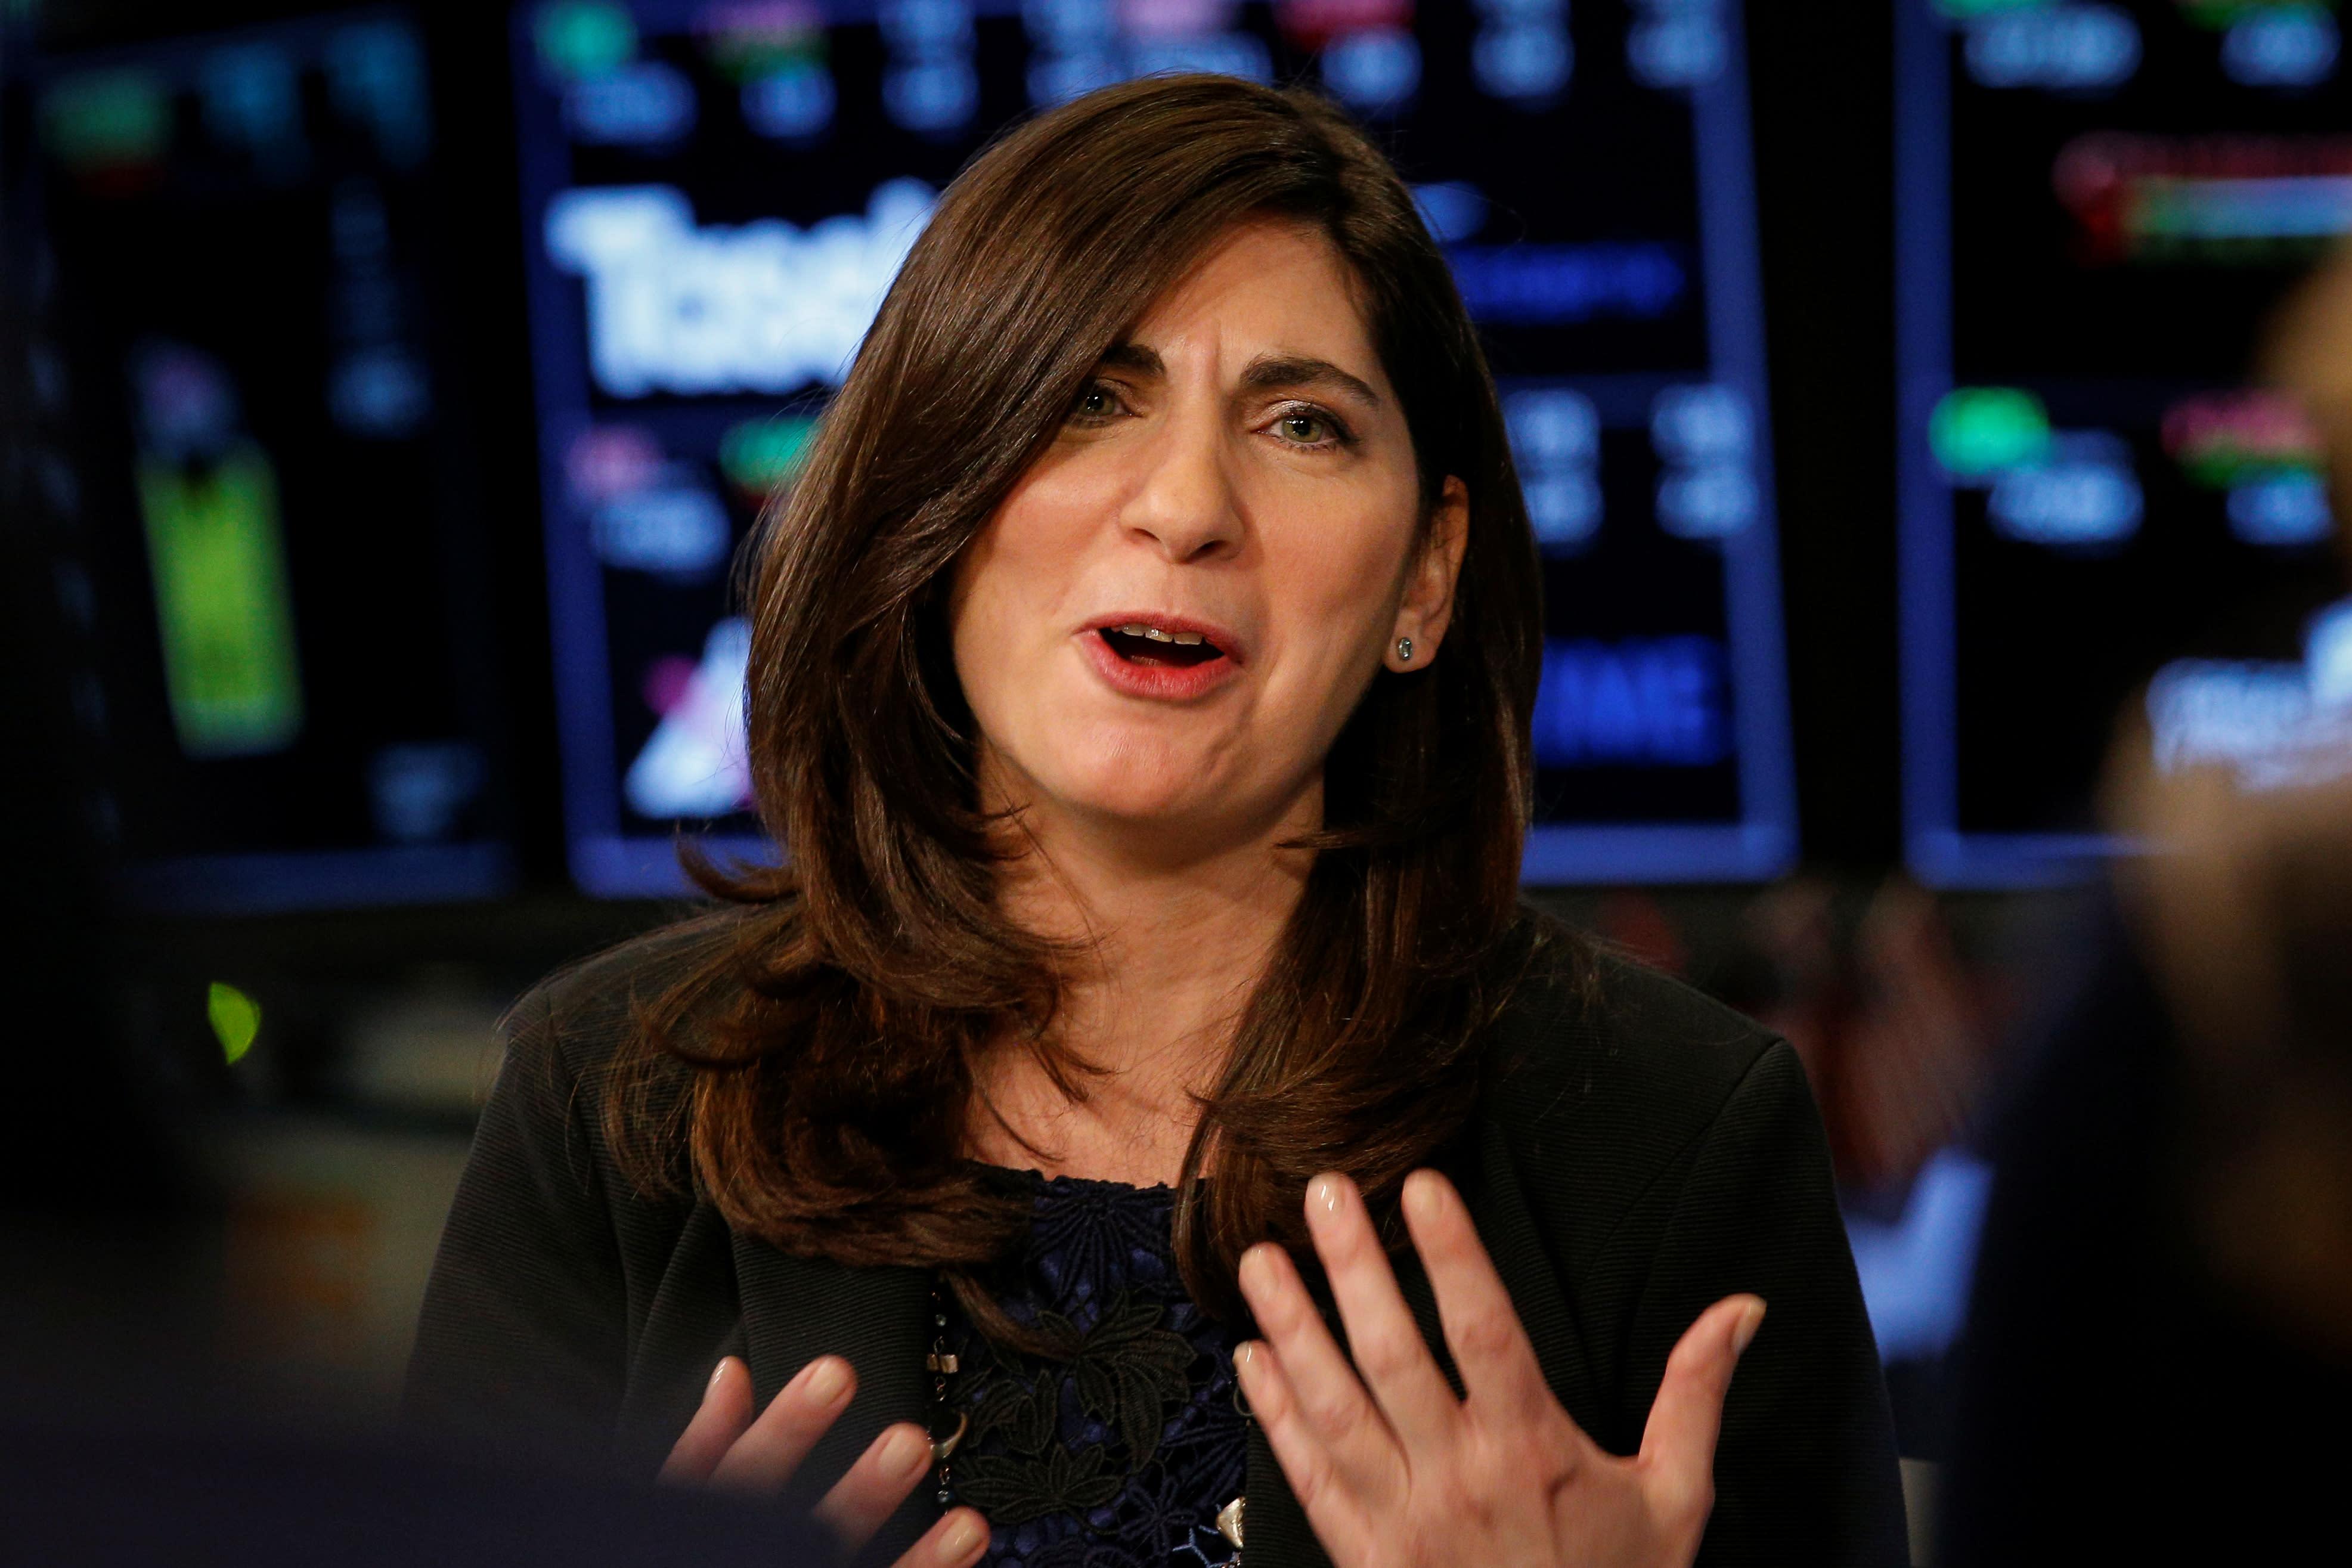 Markets will stay open despite 'unprecedented anxiety' over coronavirus